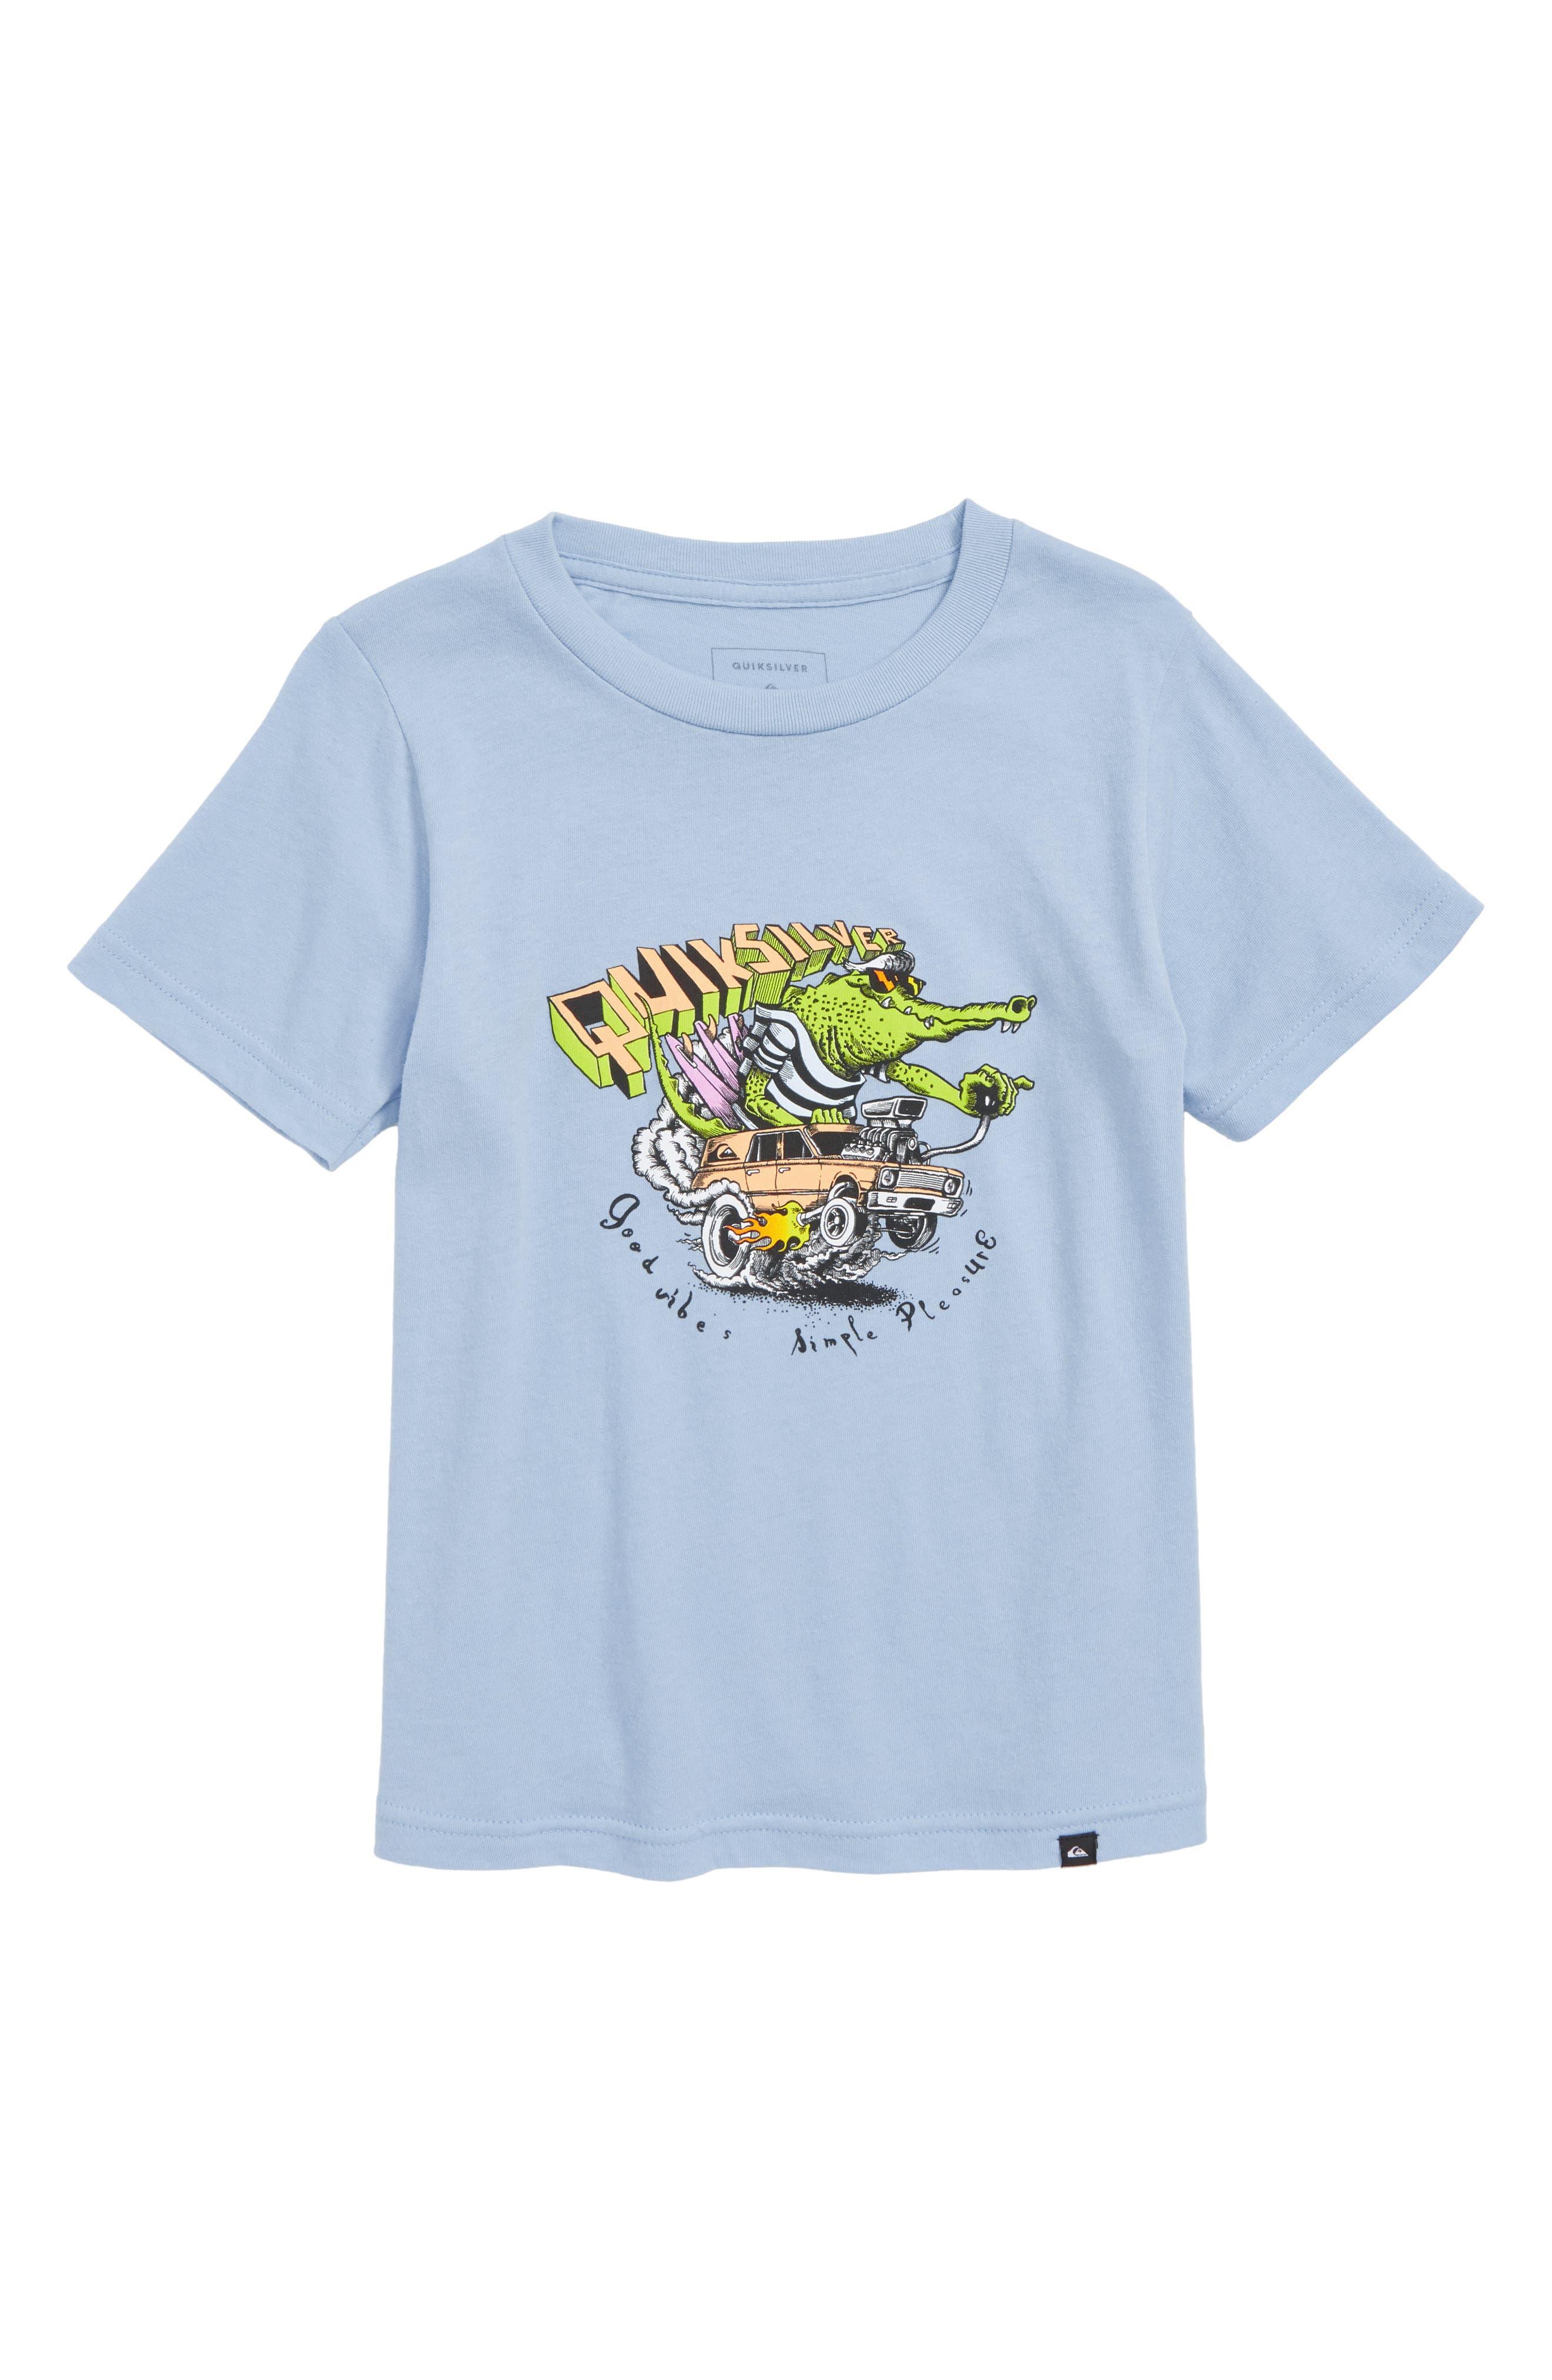 Quiksilver Crocodile Farwest Graphic T-Shirt (Toddler Boys & Little Boys)